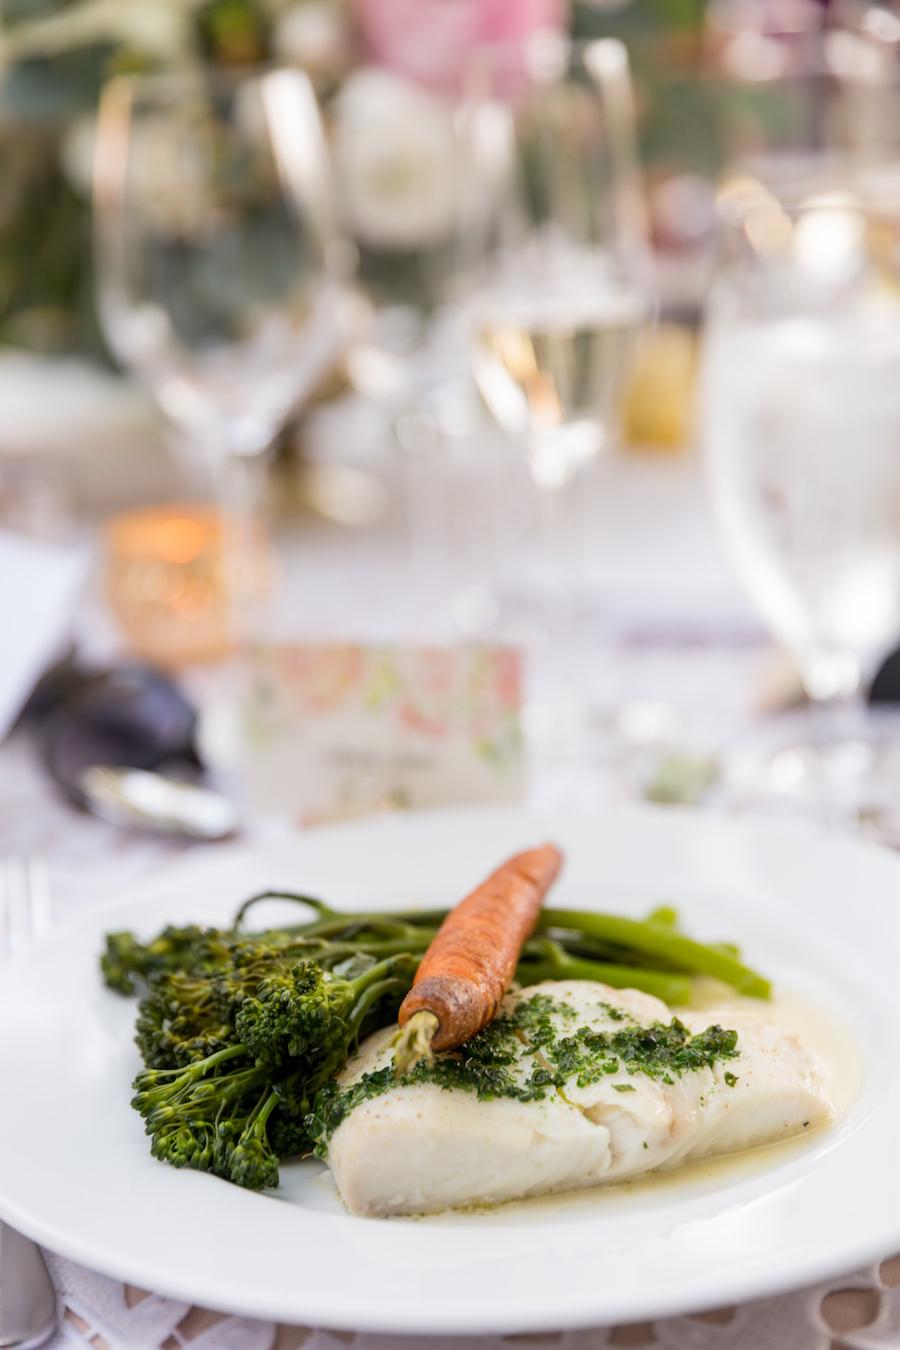 Chic and Organic Outdoor Wedding at Harvest Inn127.jpg